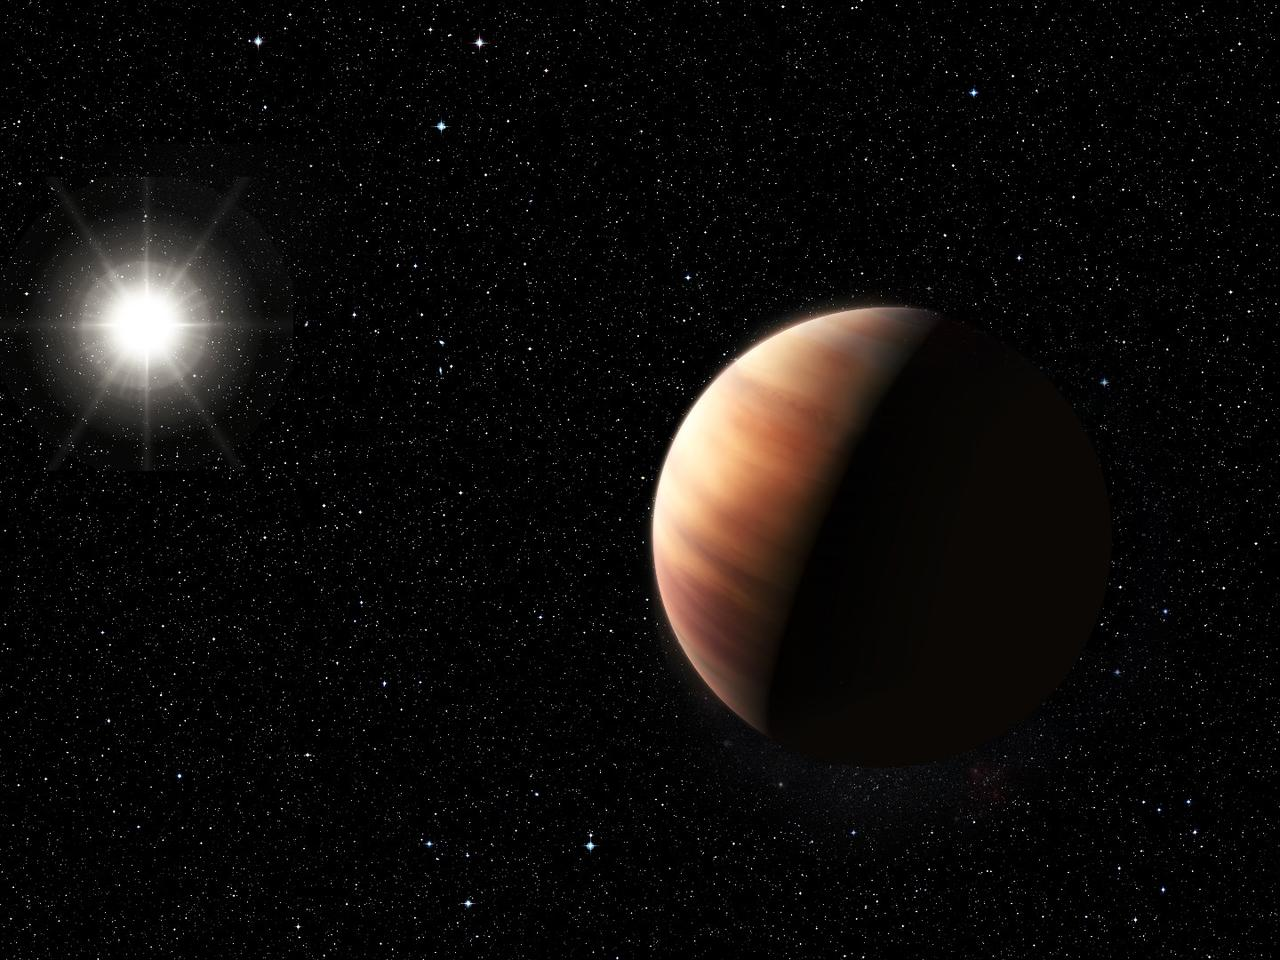 Artist's impression of Jupiter's twin orbiting HIP 11915